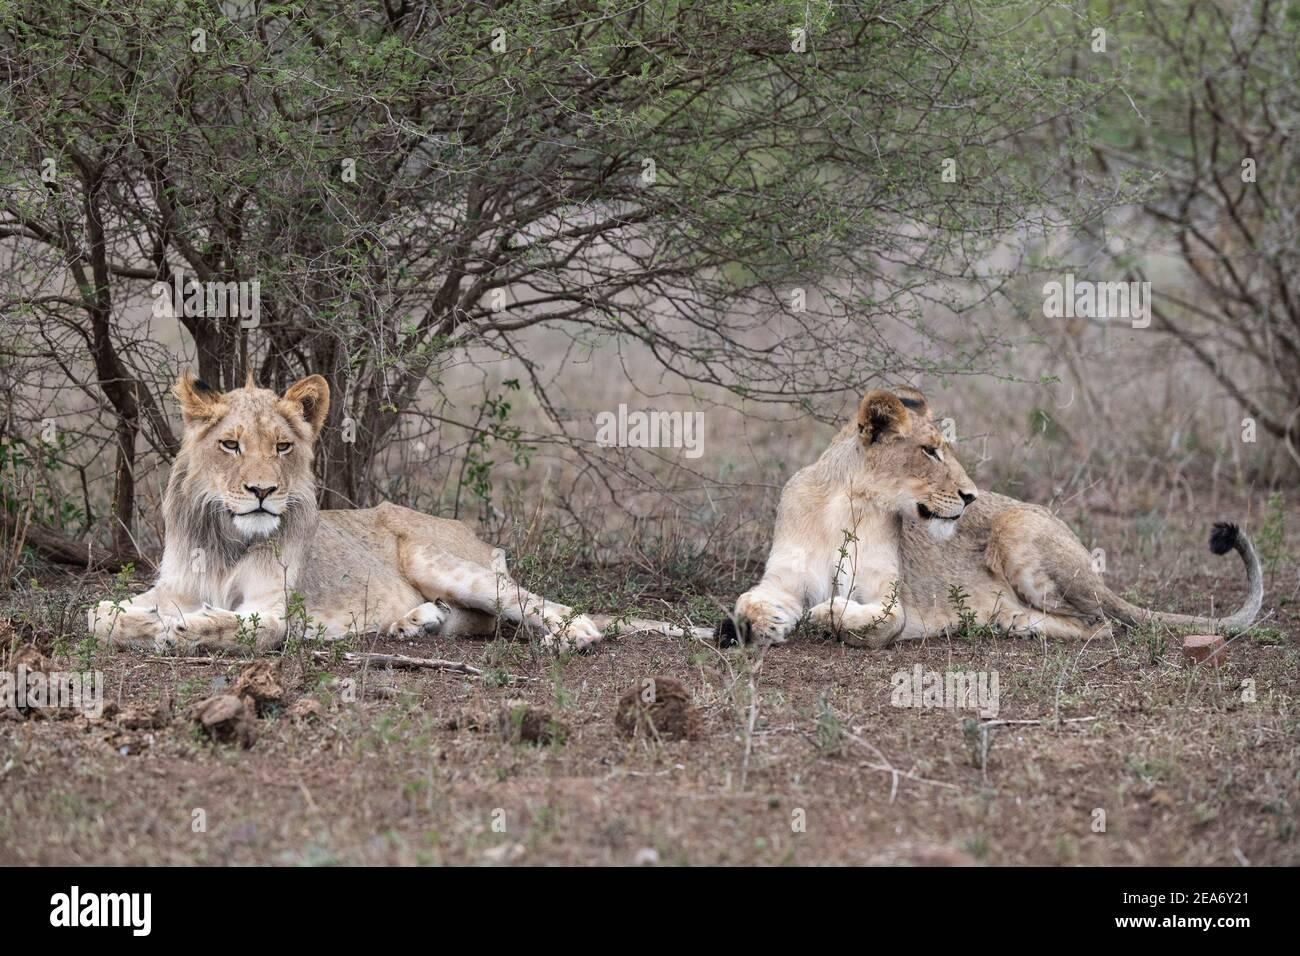 Cachorros de león, Panthero leo, Parque Nacional Kruger, Sudáfrica Foto de stock